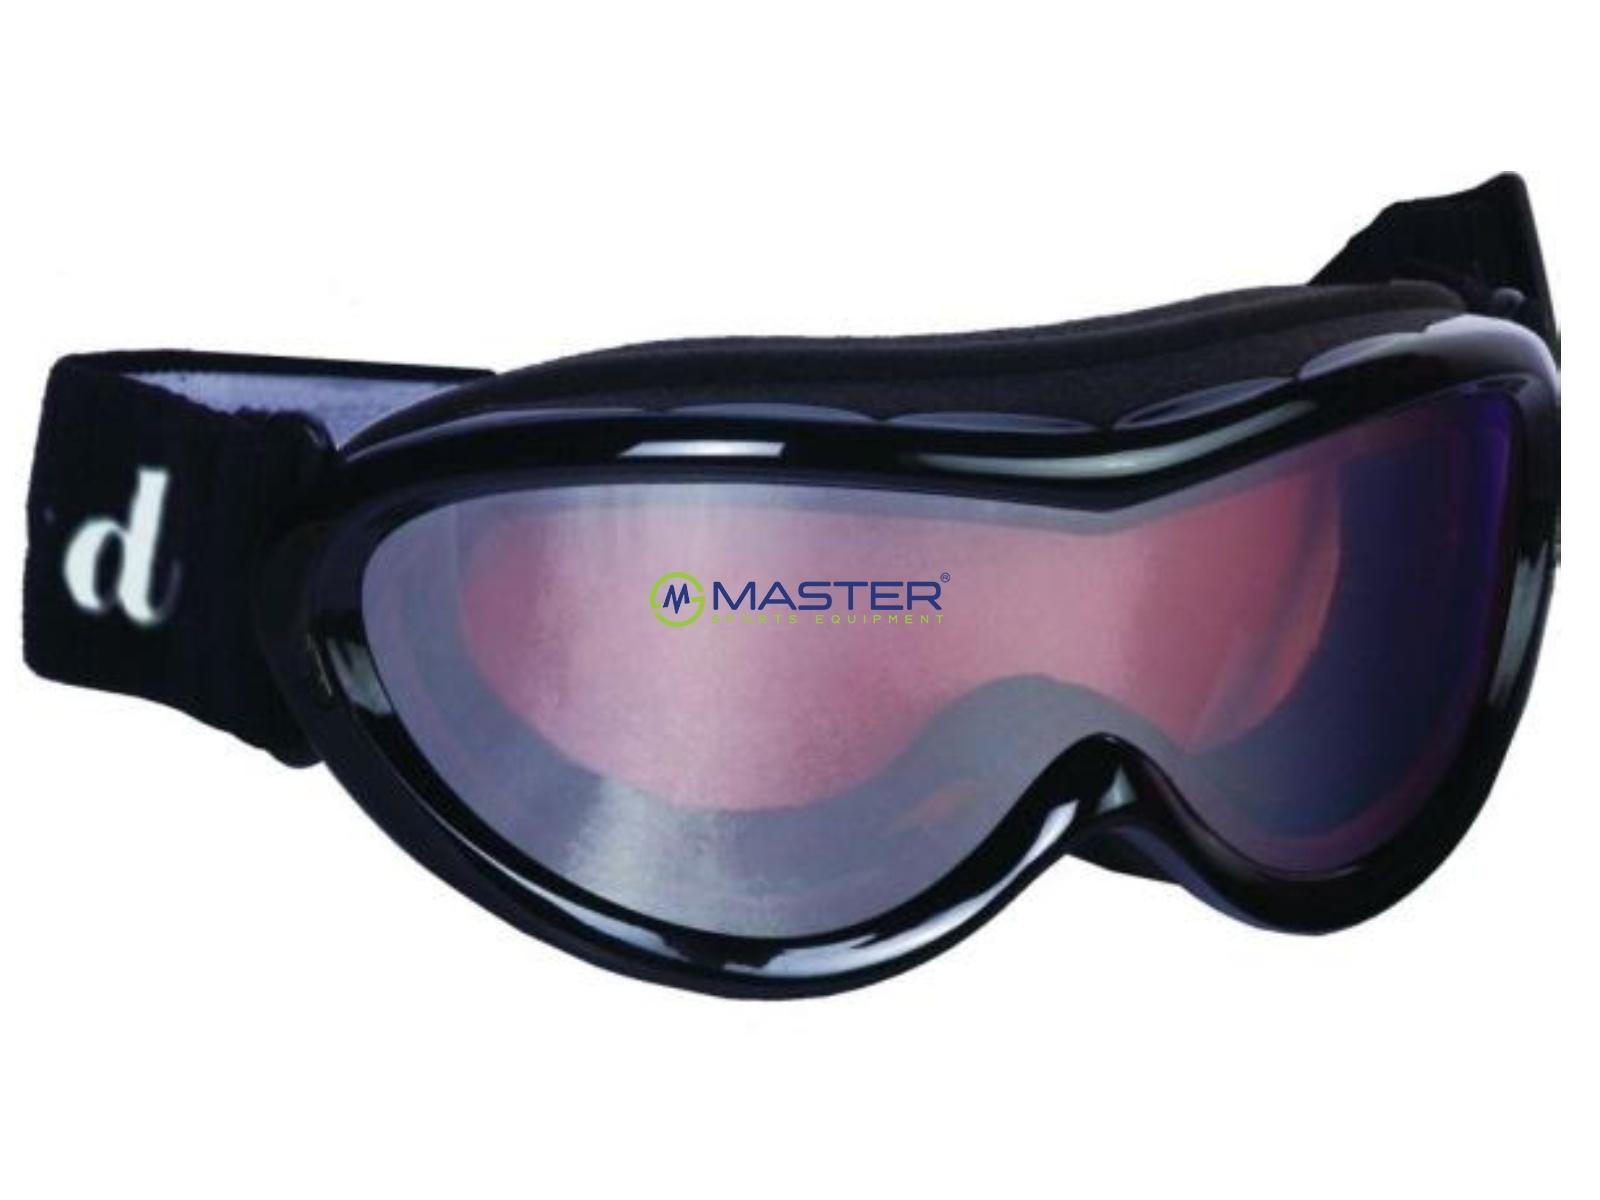 Lyžiarske okuliare Blizzard 908 DAZ - dámske - čierne. -4%. Poslať odkaz f11dedde9d7